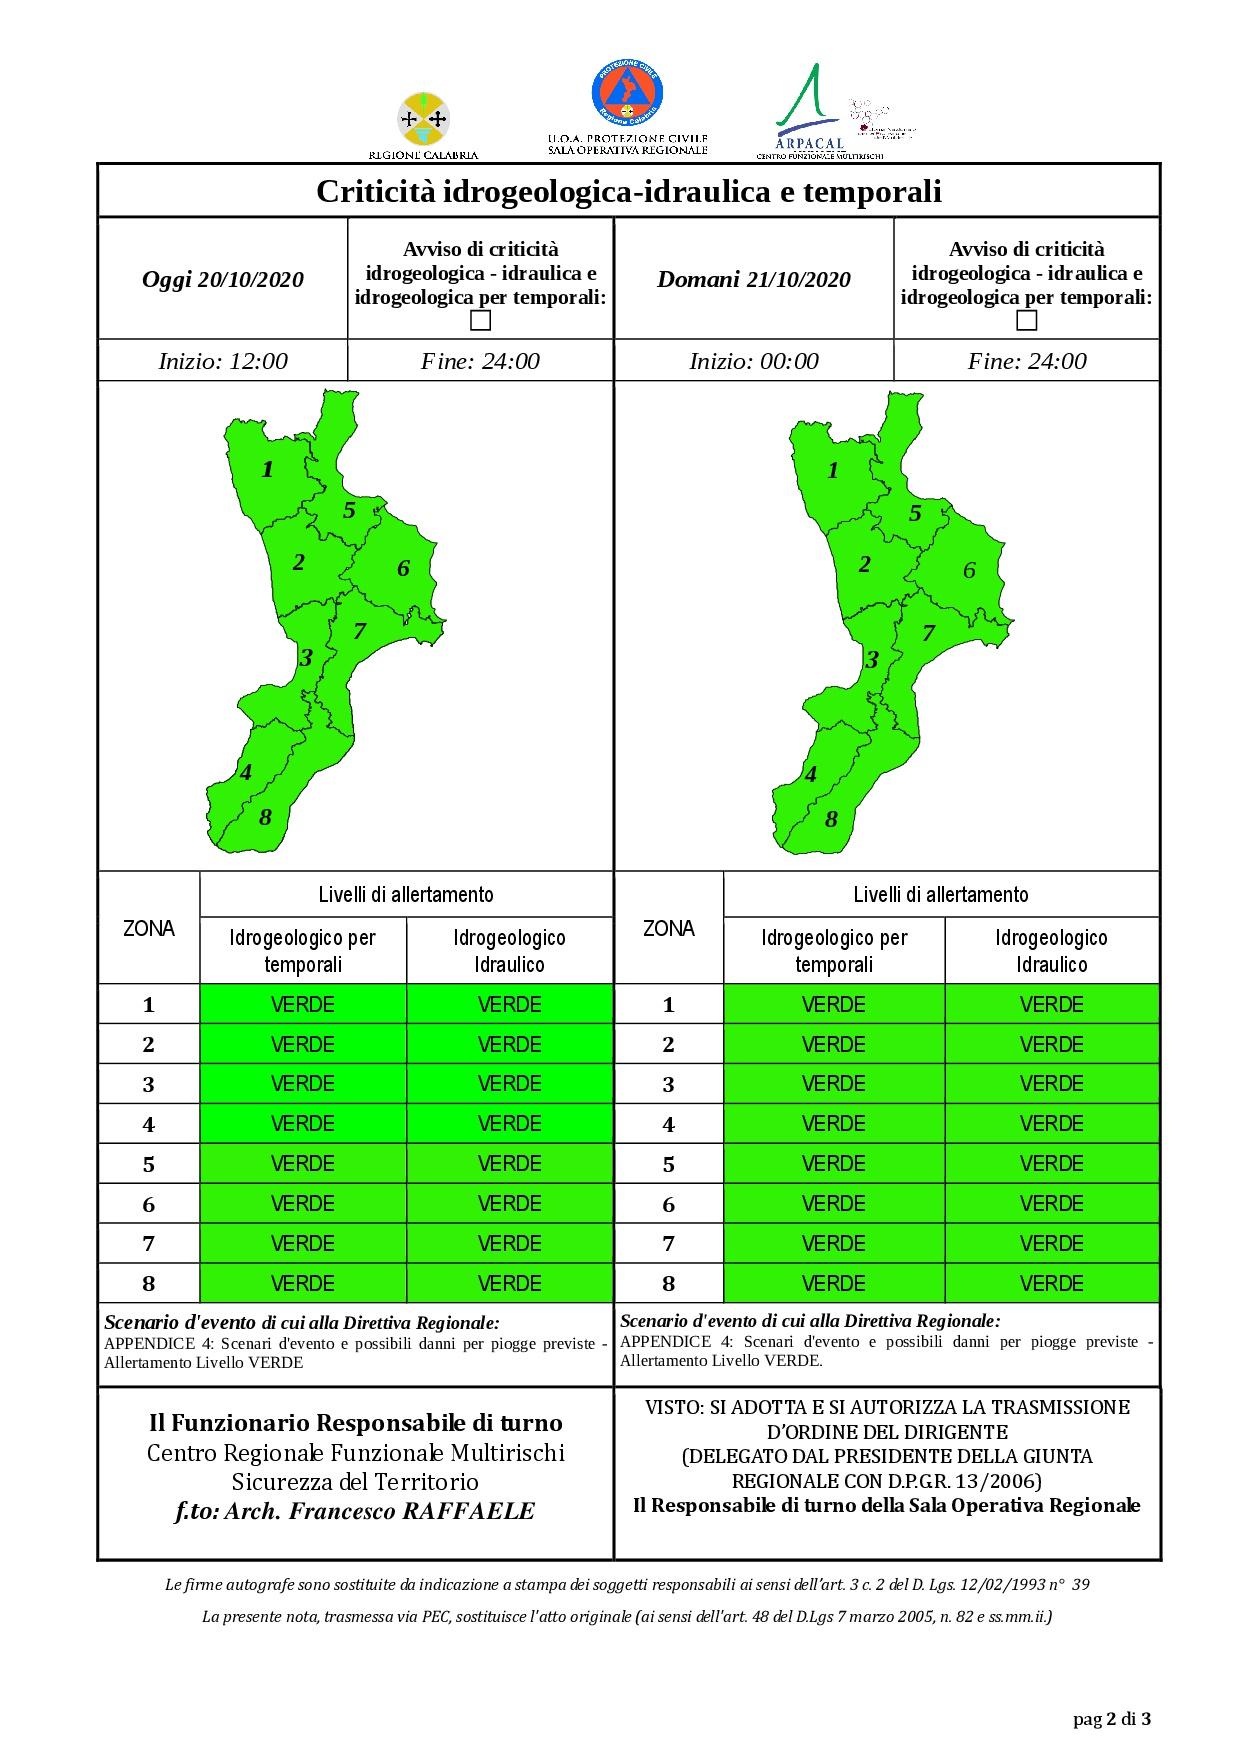 Criticità idrogeologica-idraulica e temporali in Calabria 20-10-2020